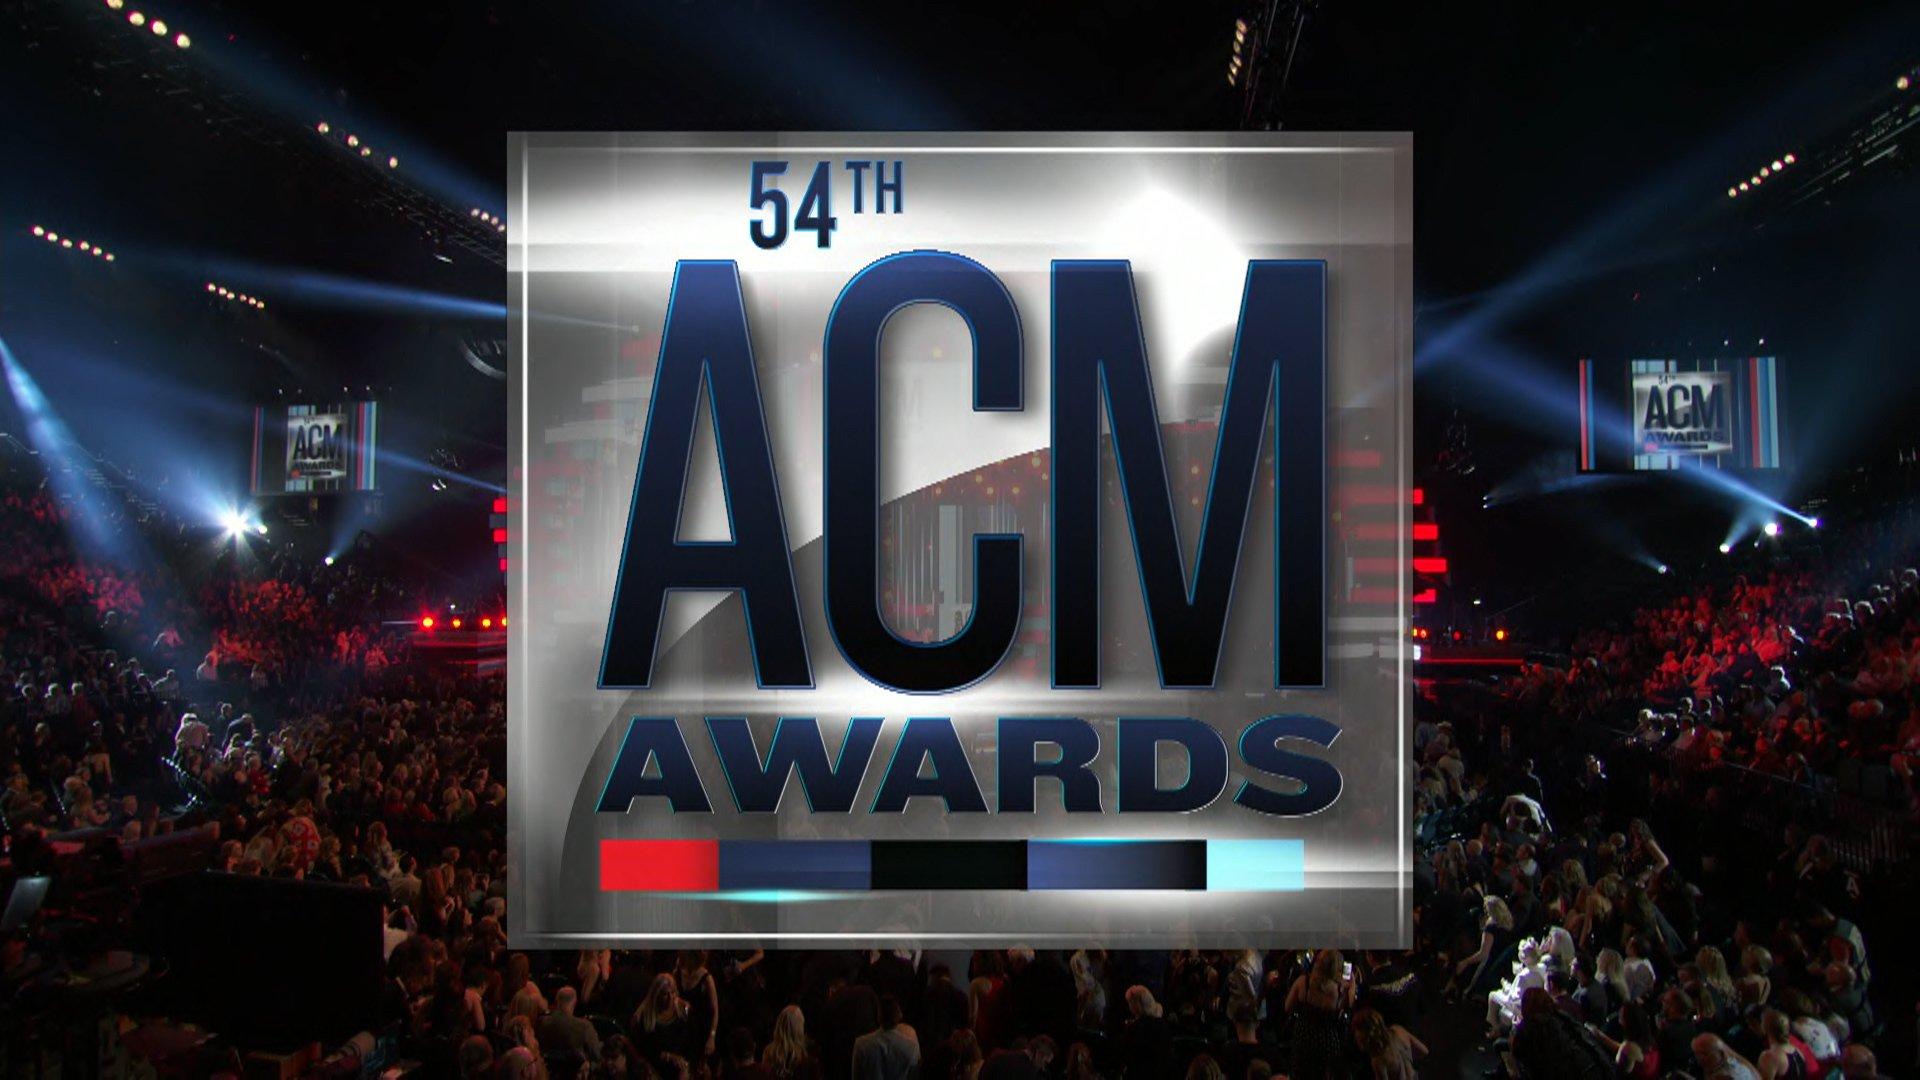 HustleTV.tv 54th annual Academy of Country Music Awards DJ Hustle